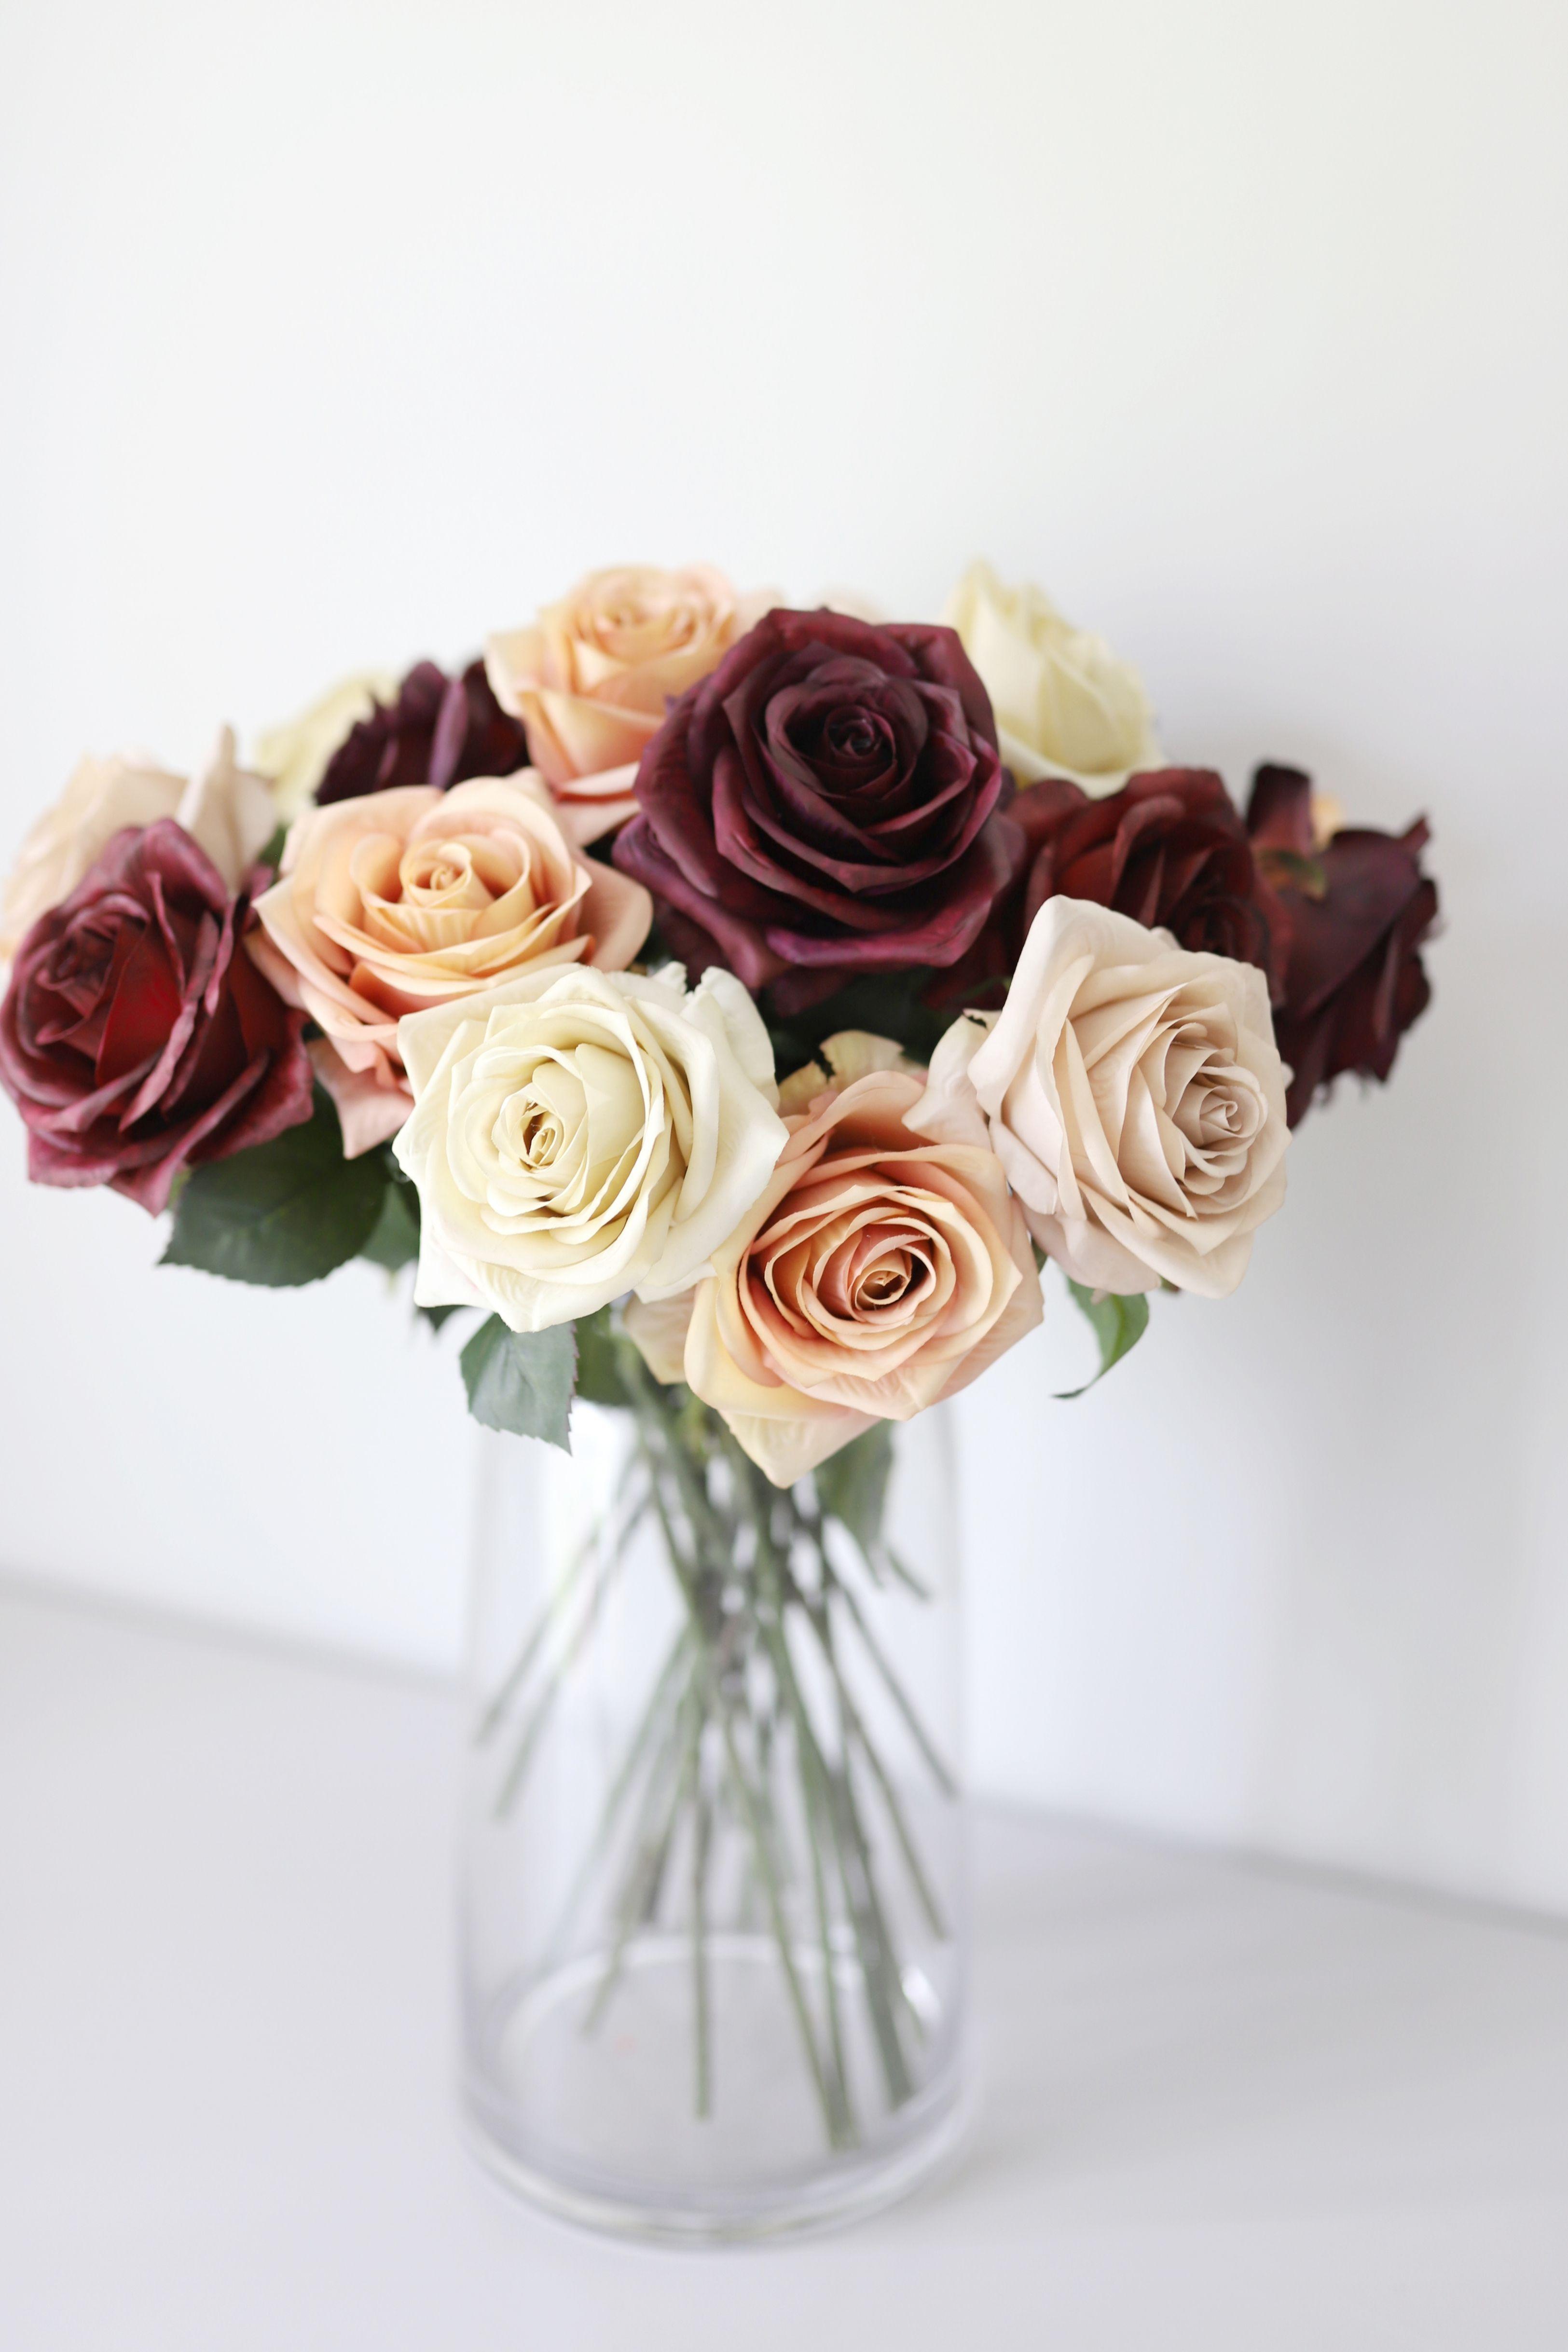 Burgundy Fake Flowers Rose In 2020 Rose Flower Arrangements Fall Flower Wedding Bouquets Diy Wedding Flowers Bouquet